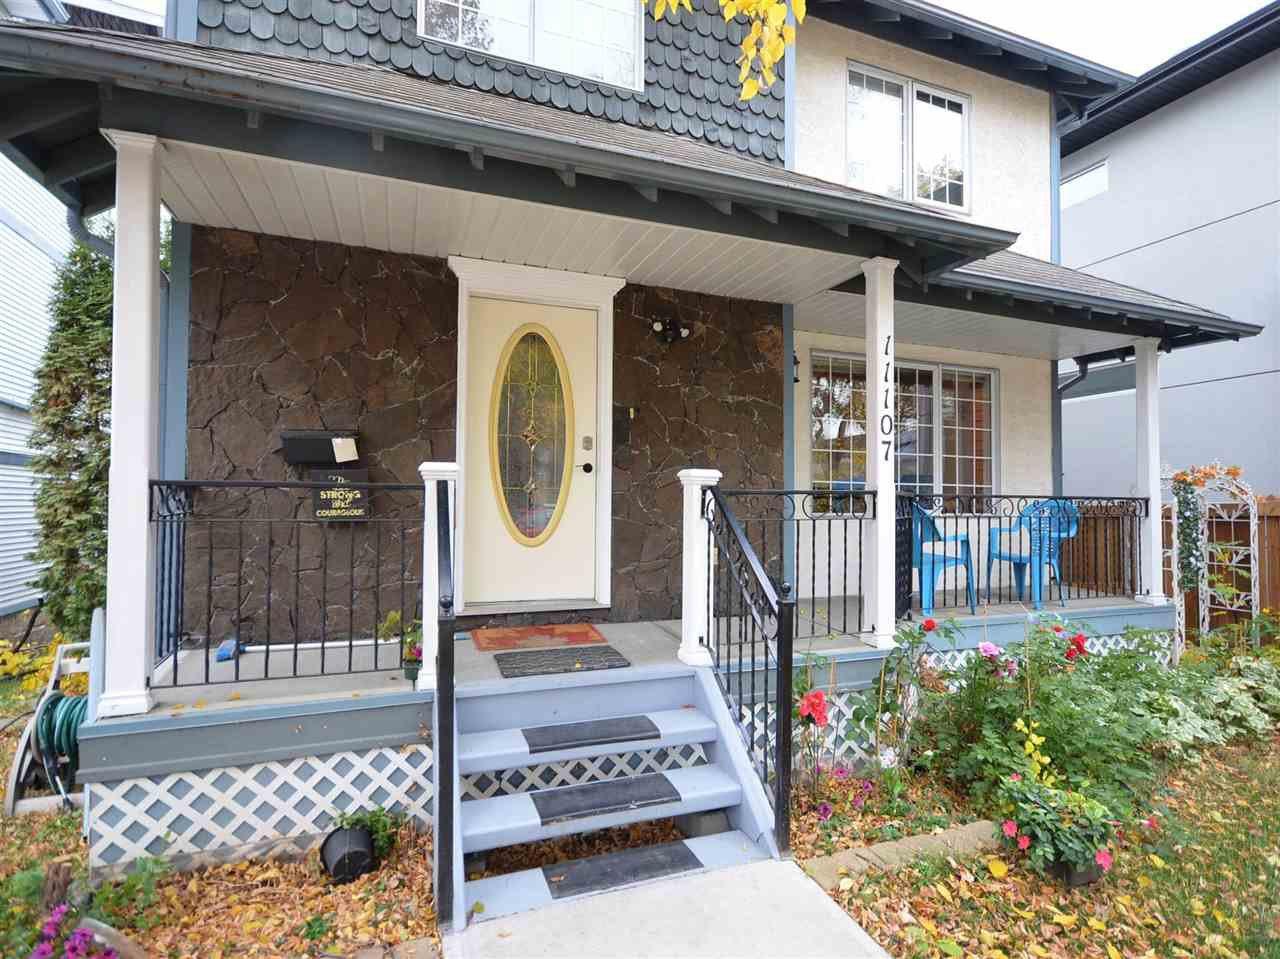 Main Photo: 11107 UNIVERSITY Avenue in Edmonton: Zone 15 House for sale : MLS®# E4224990